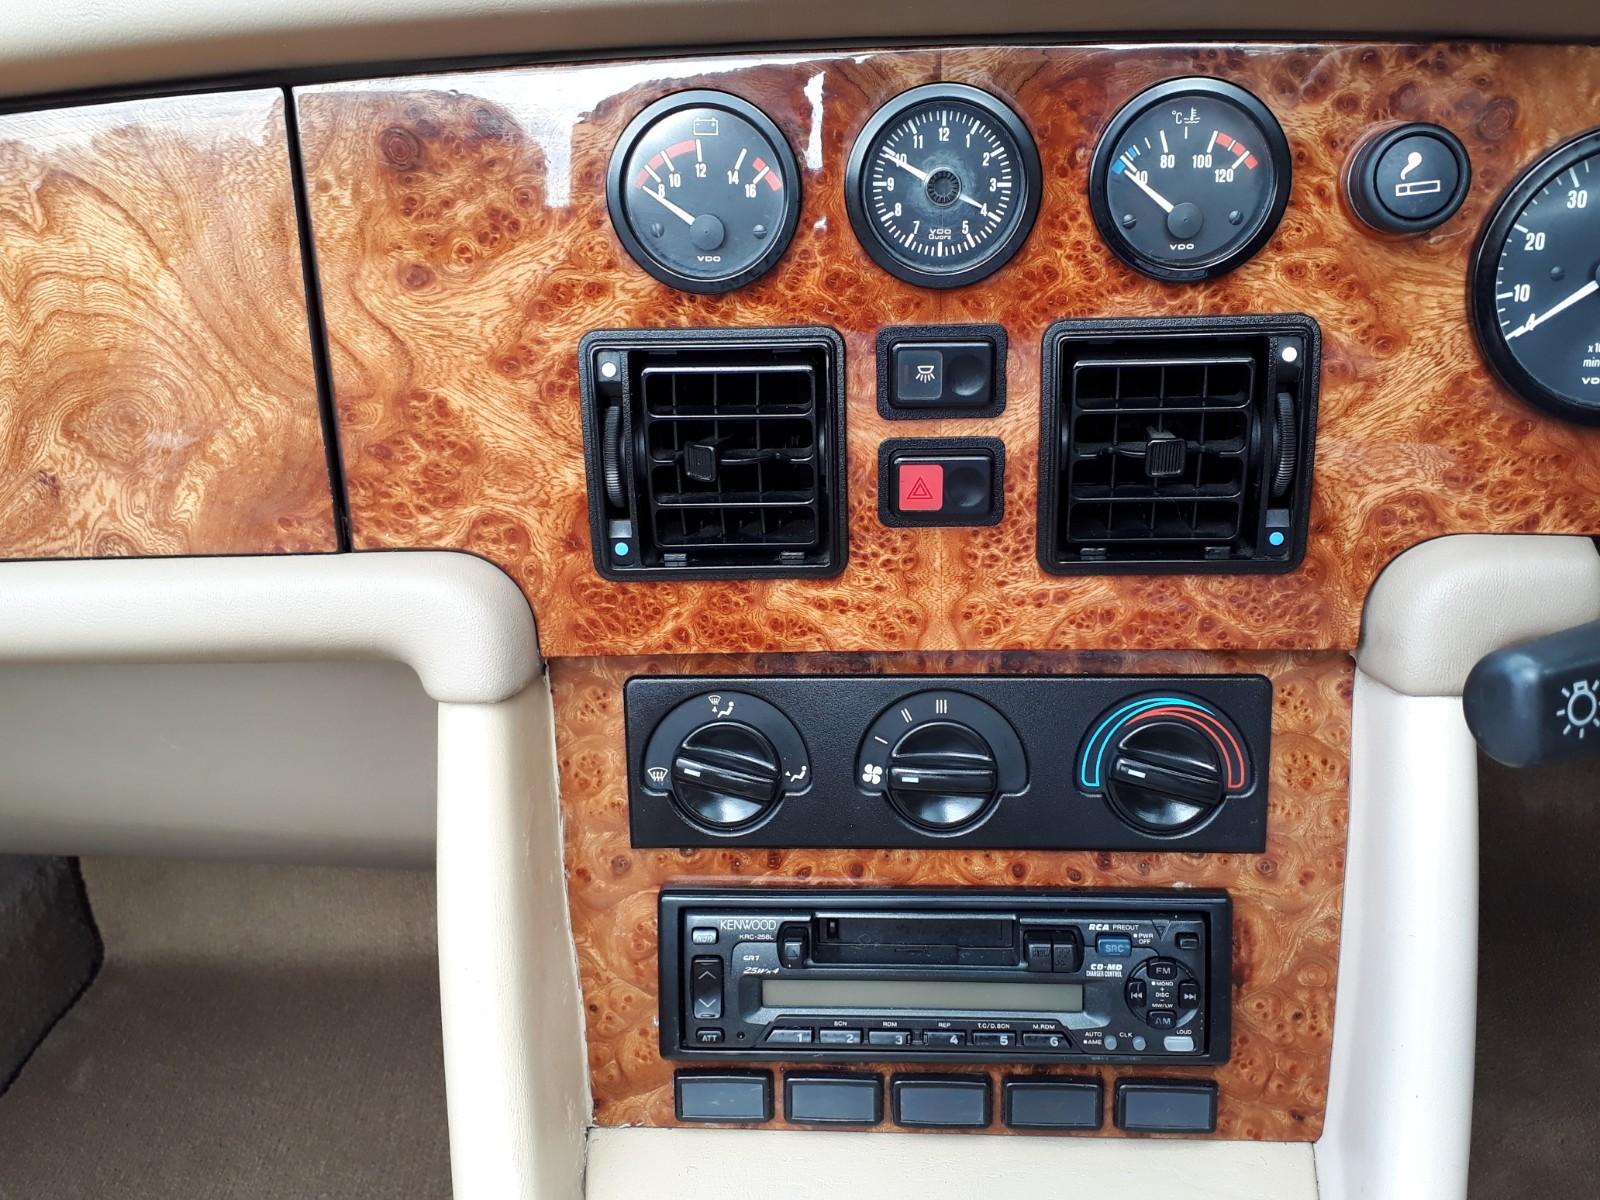 MG RV8 £20,995